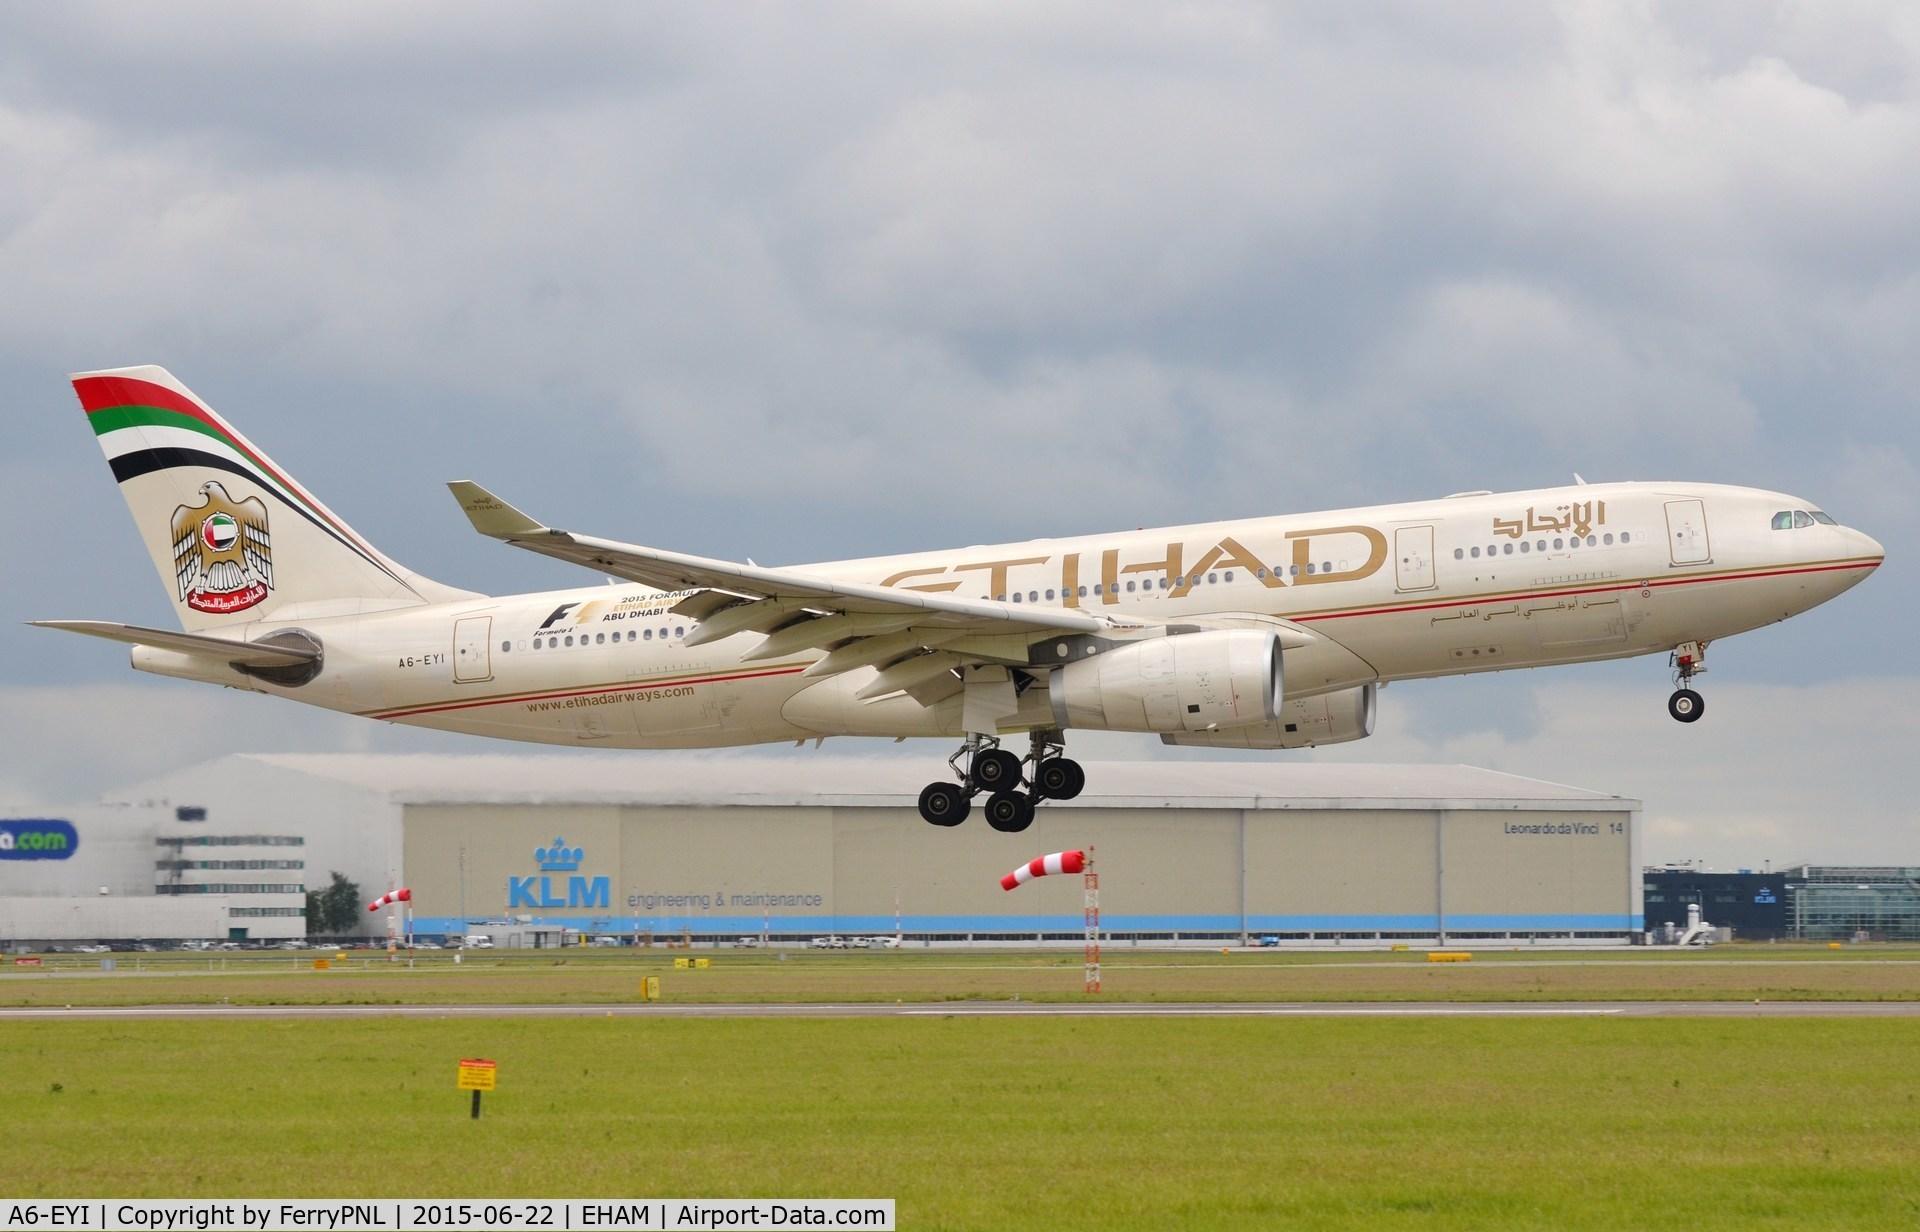 A6-EYI, 2006 Airbus A330-243 C/N 730, Etihad A332 landing in AMS